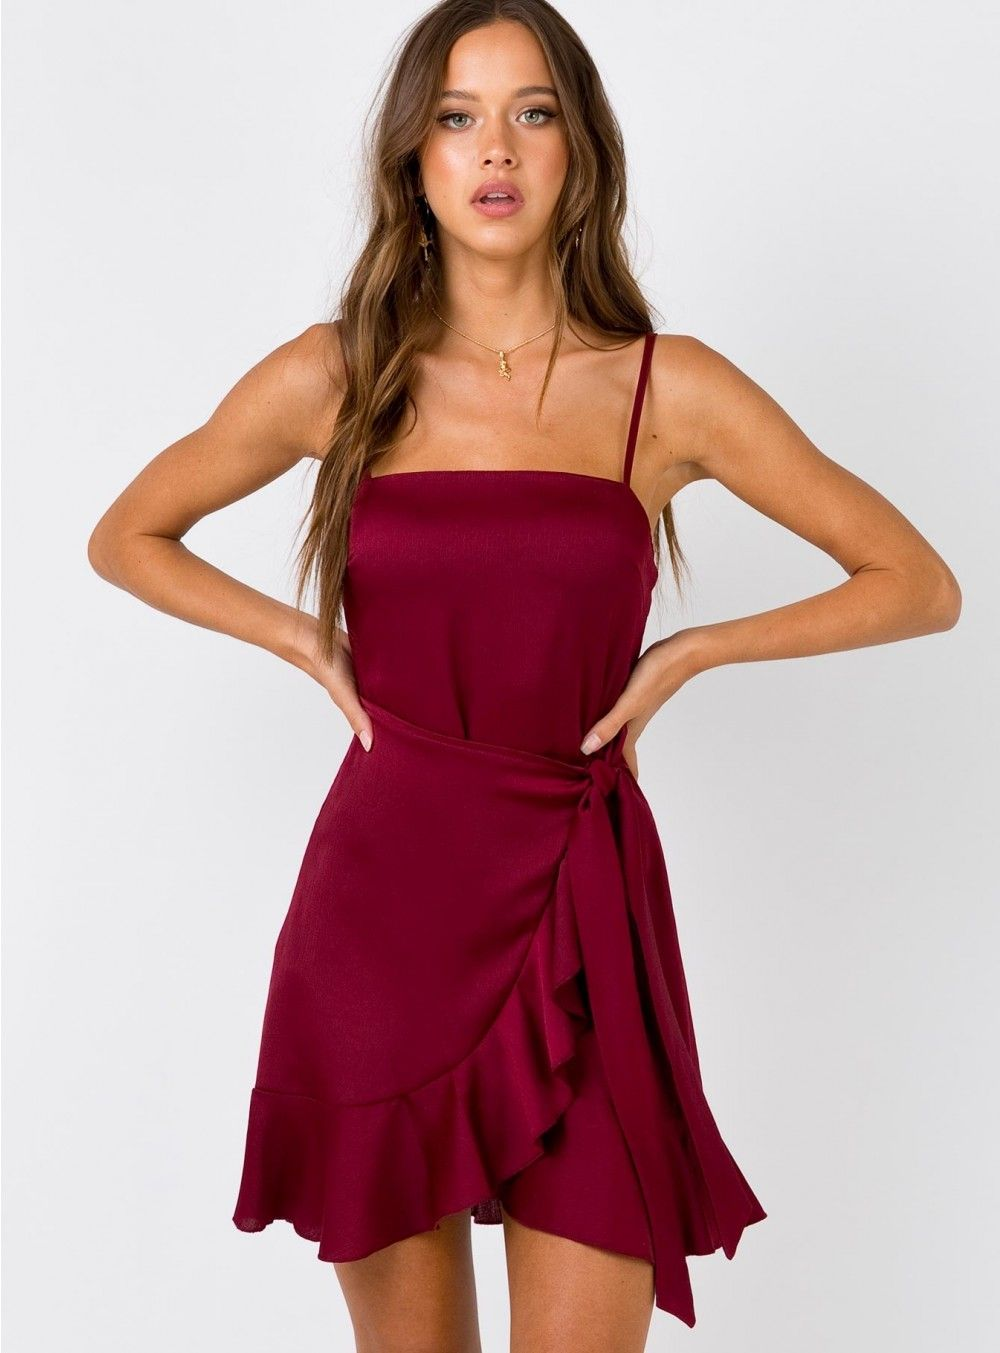 Aleutian Mini Dress Wine Mini Dress Short Dresses Red Homecoming Dresses